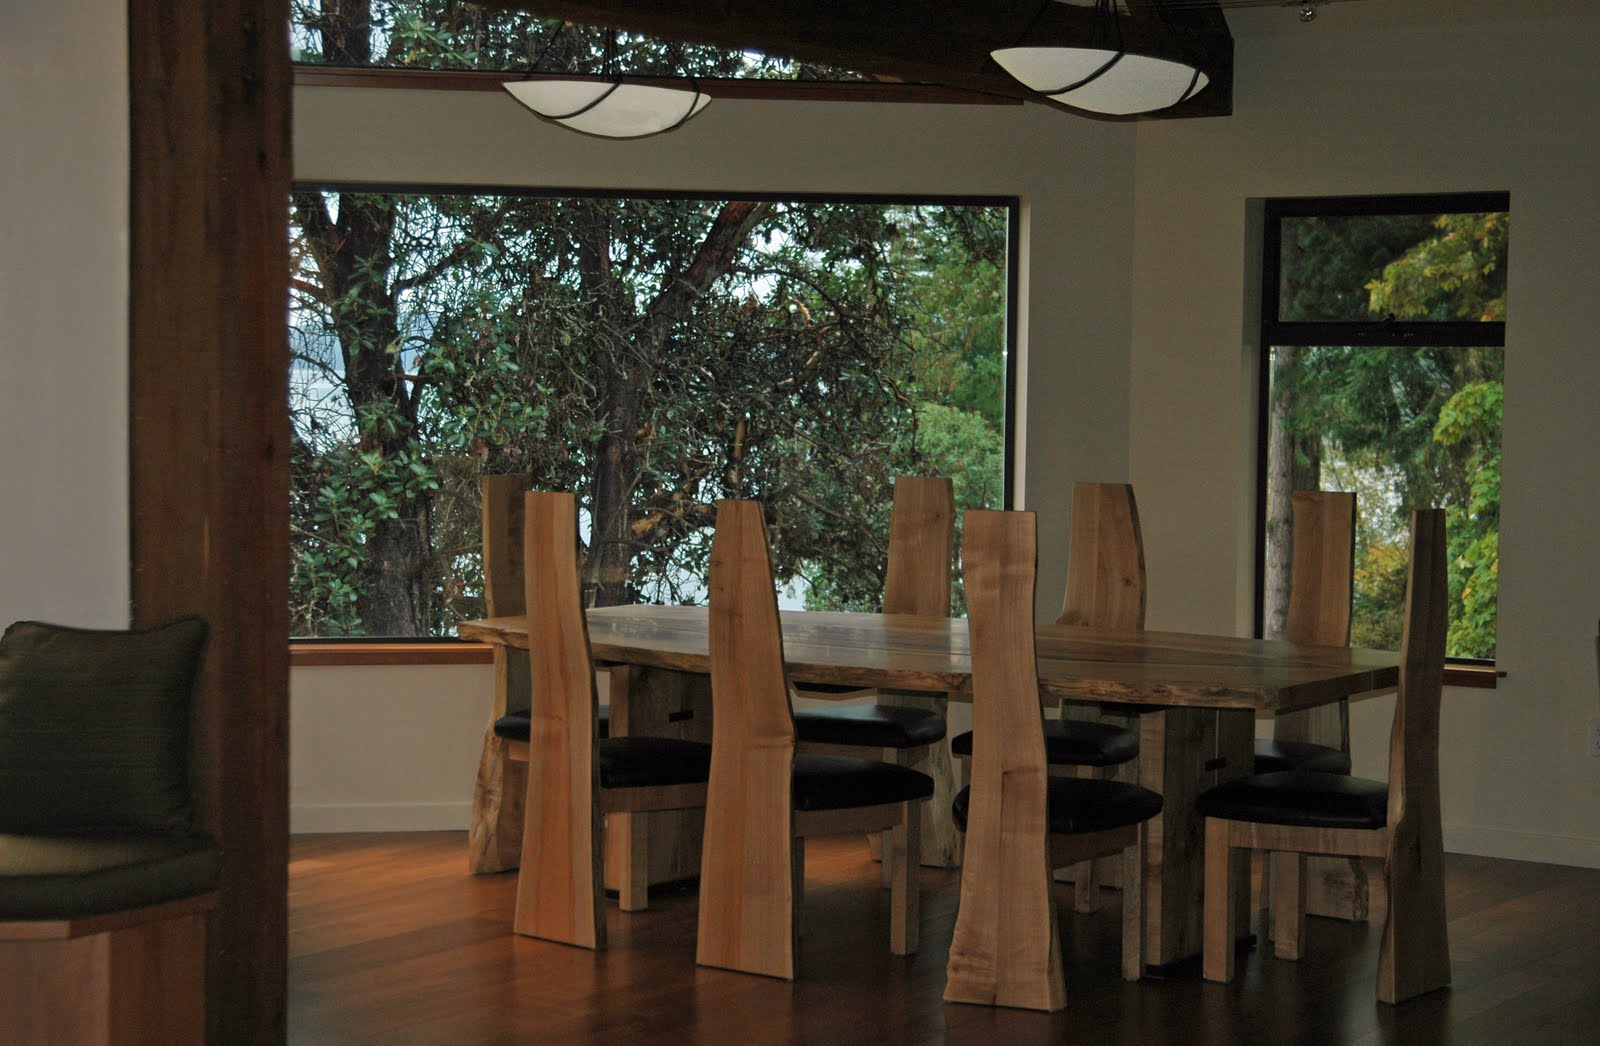 timber frames and wood. Home Design - Home Interior And Design Ideas